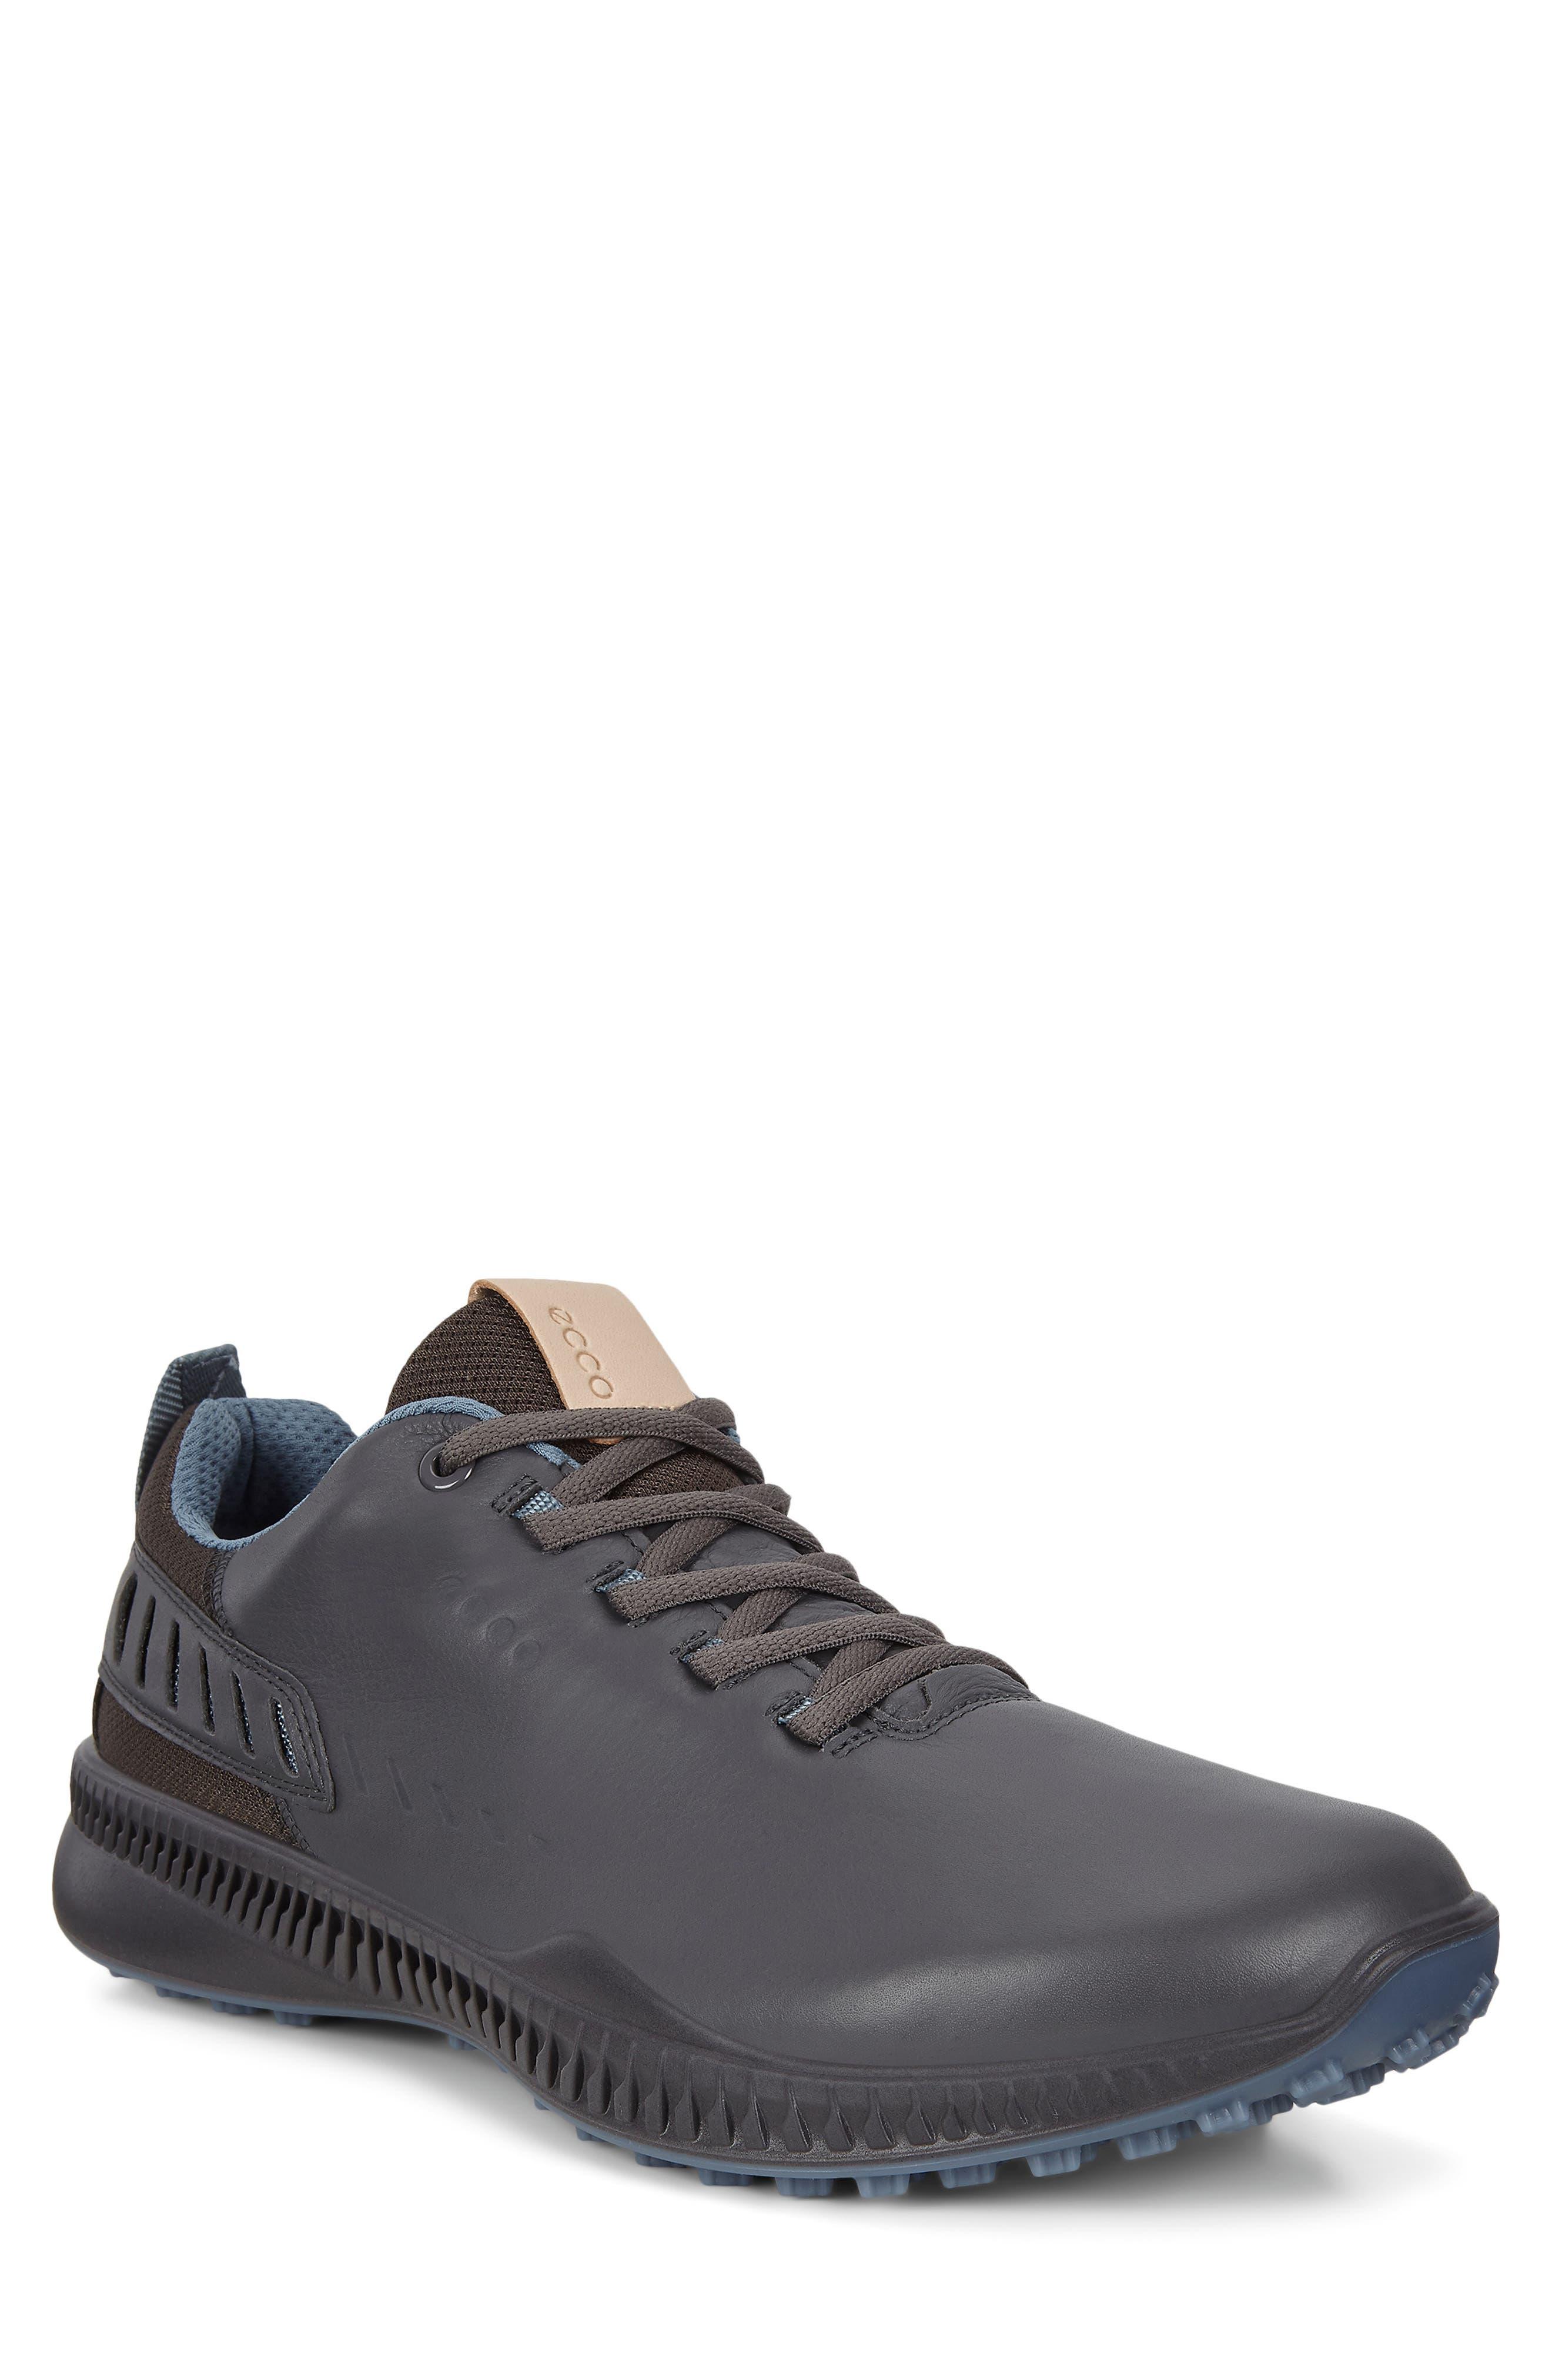 Men's Ecco S-Hybrid Golf Sneaker